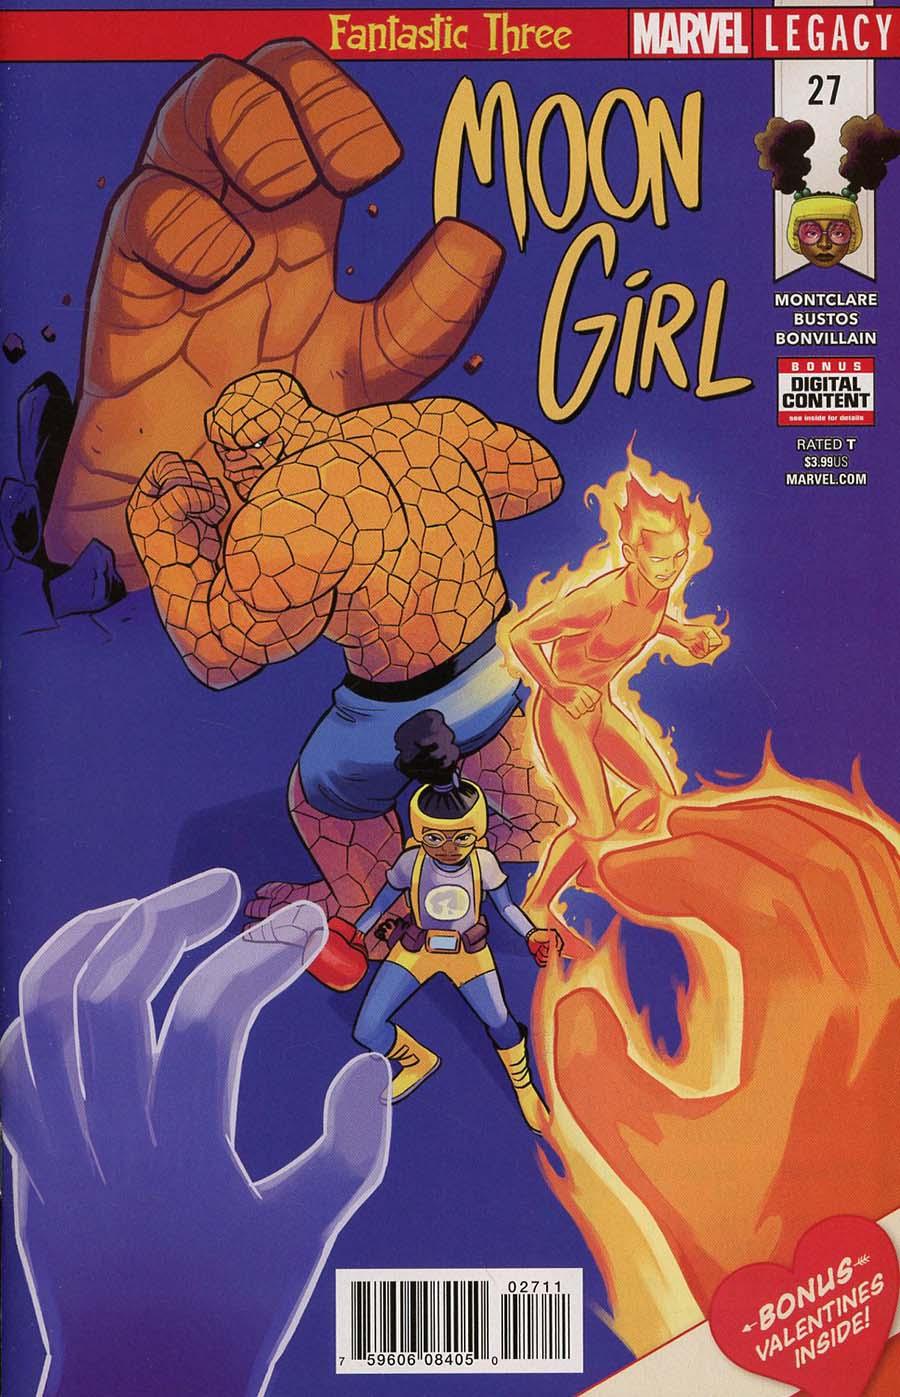 Moon Girl And Devil Dinosaur #27 (Marvel Legacy Tie-In)